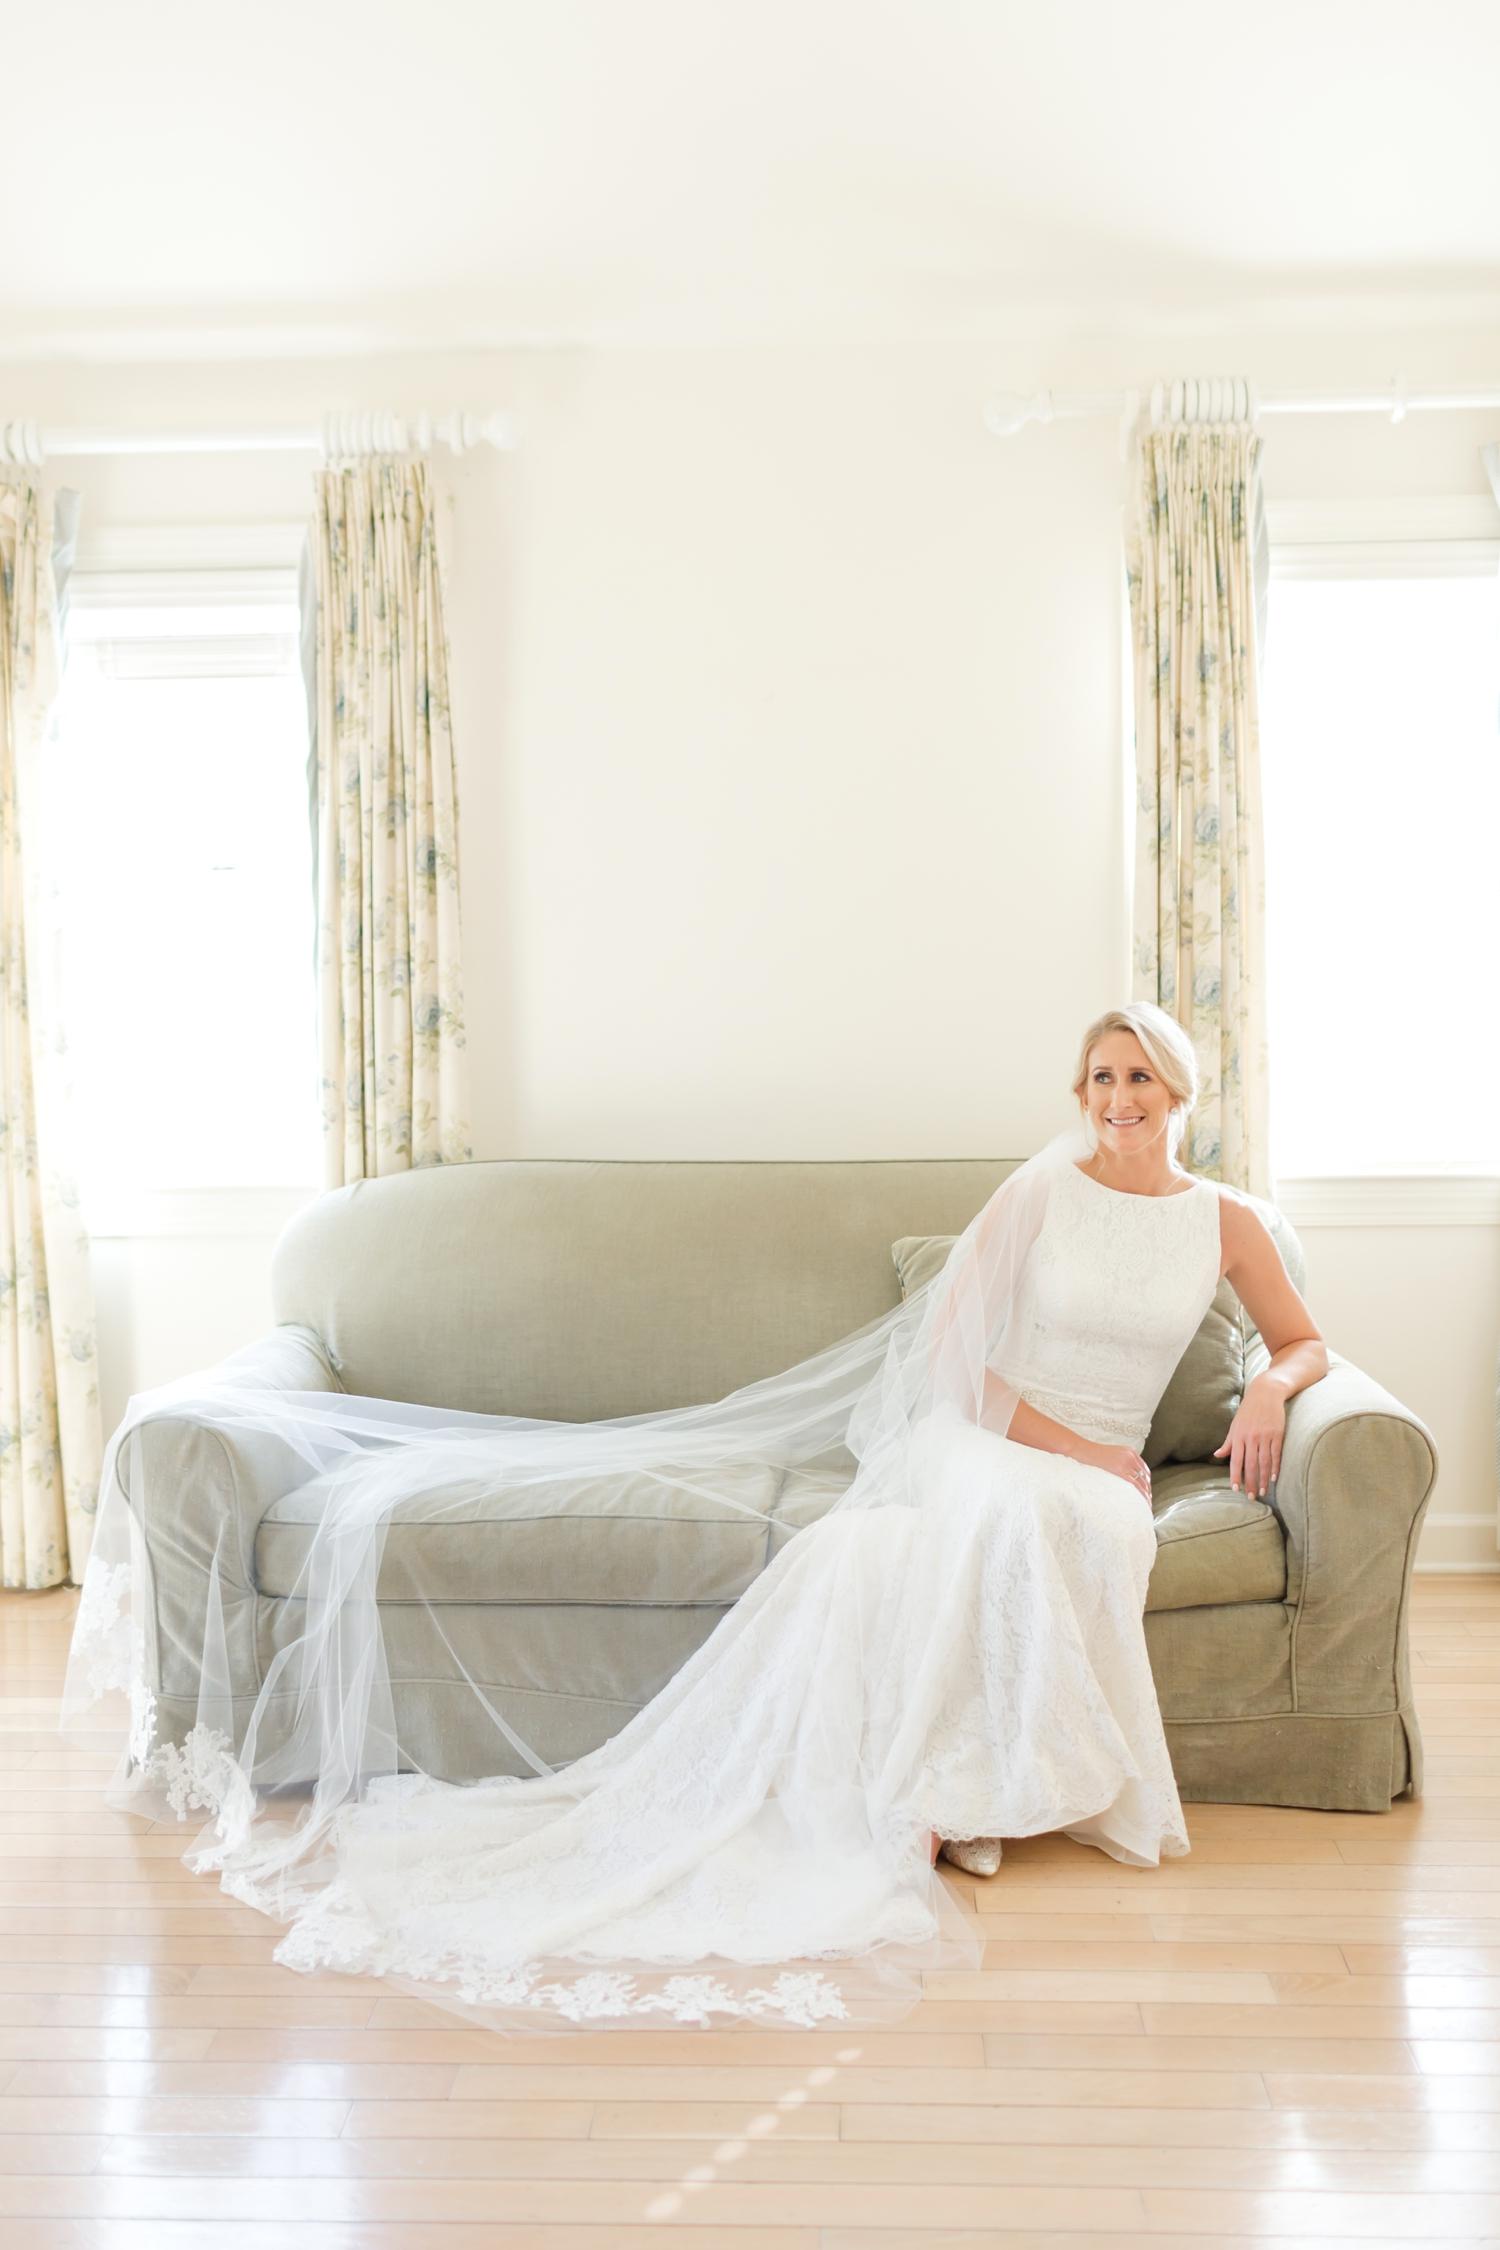 Wojciechowski Wedding-130_the-oaks-waterfront-inn-wedding-easton-maryland-wedding-photography-anna-grace-photography-photo.jpg